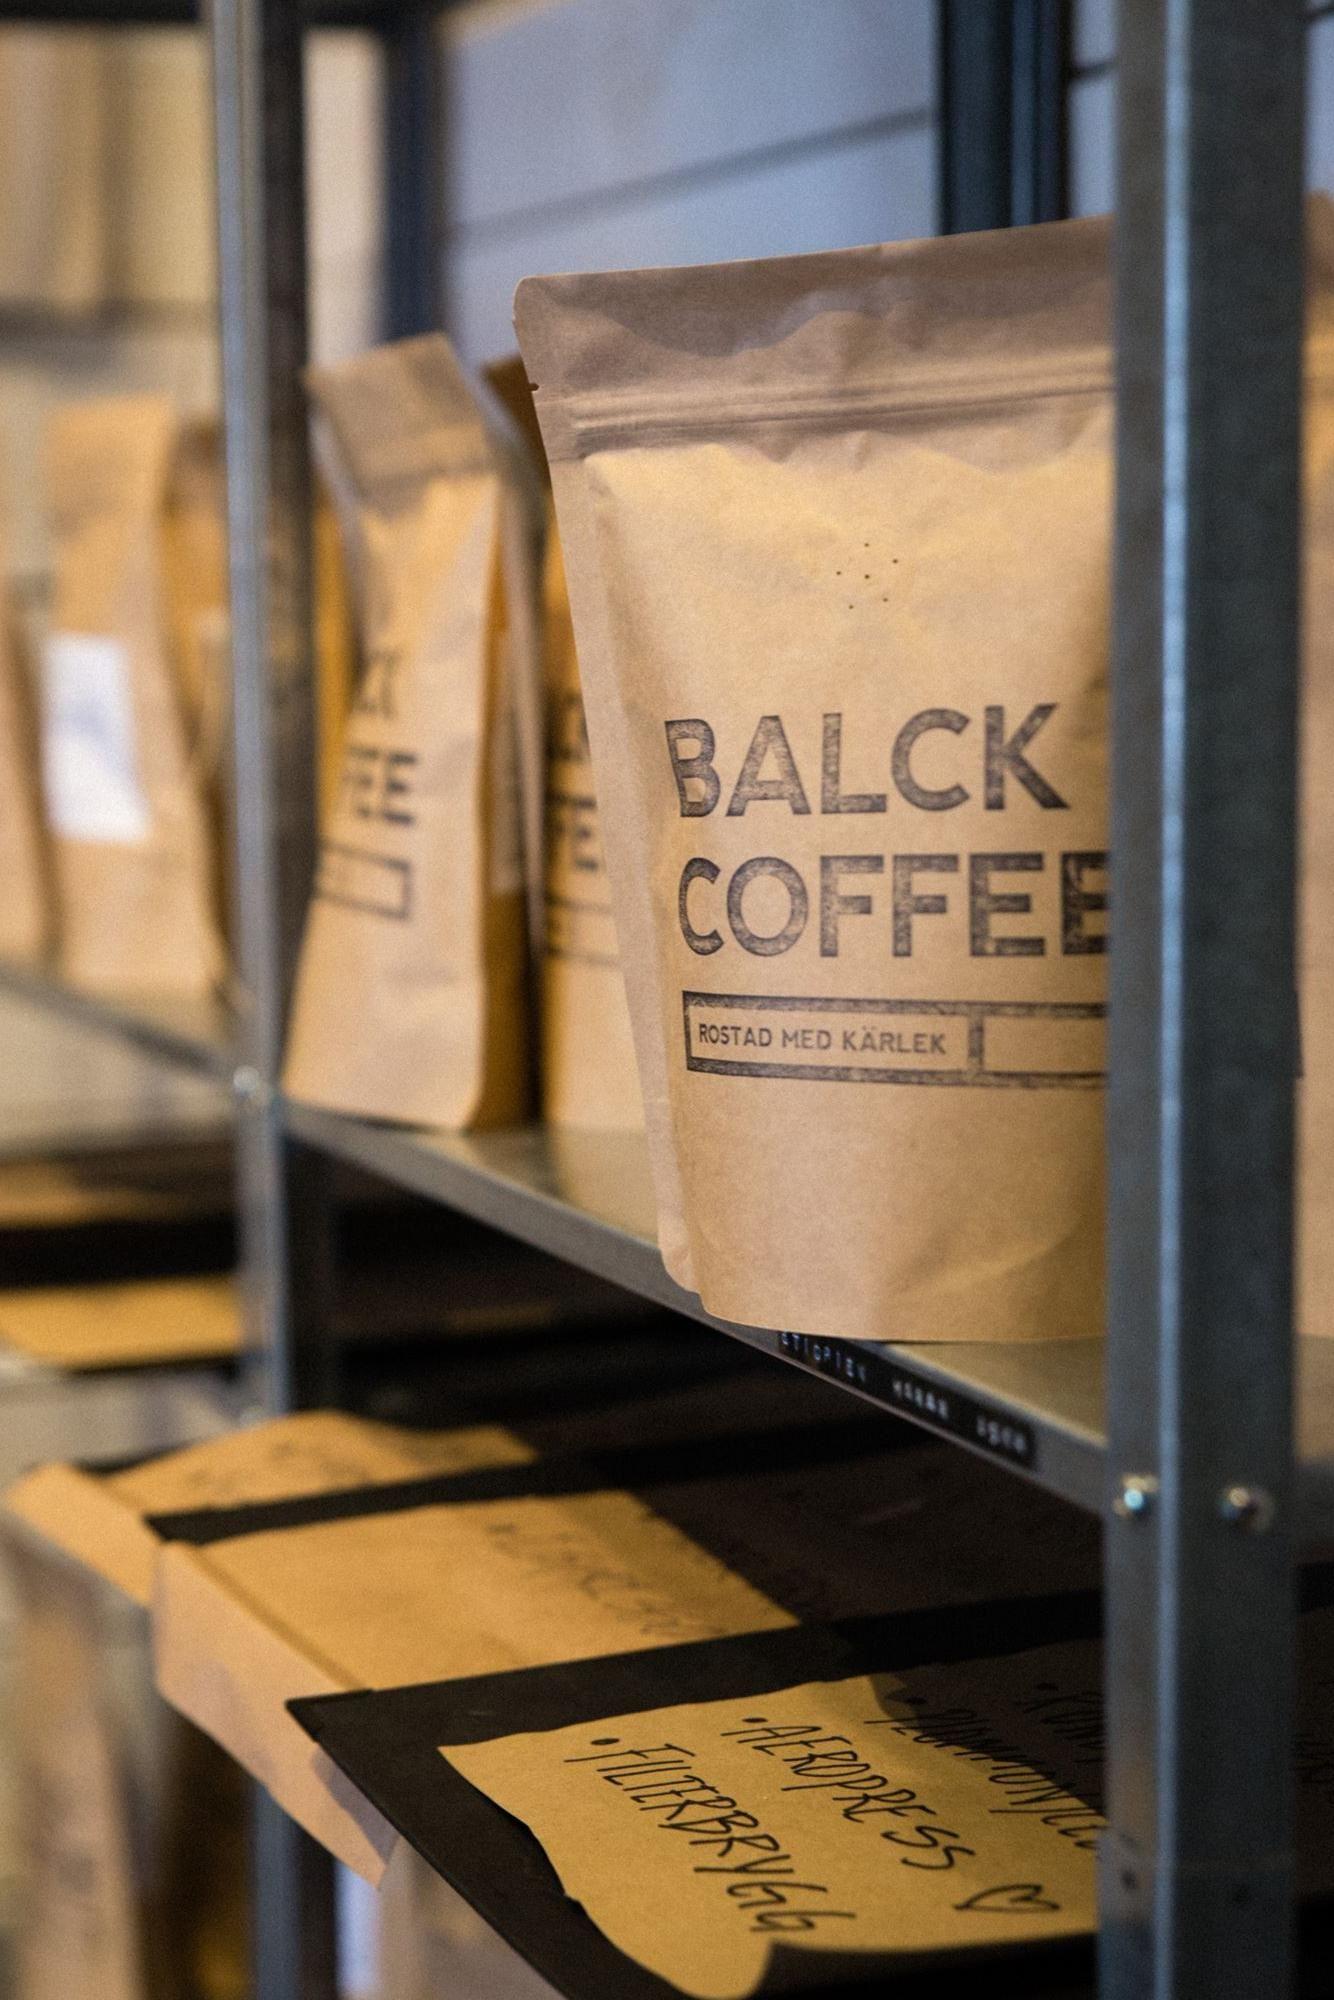 Balck Coffee